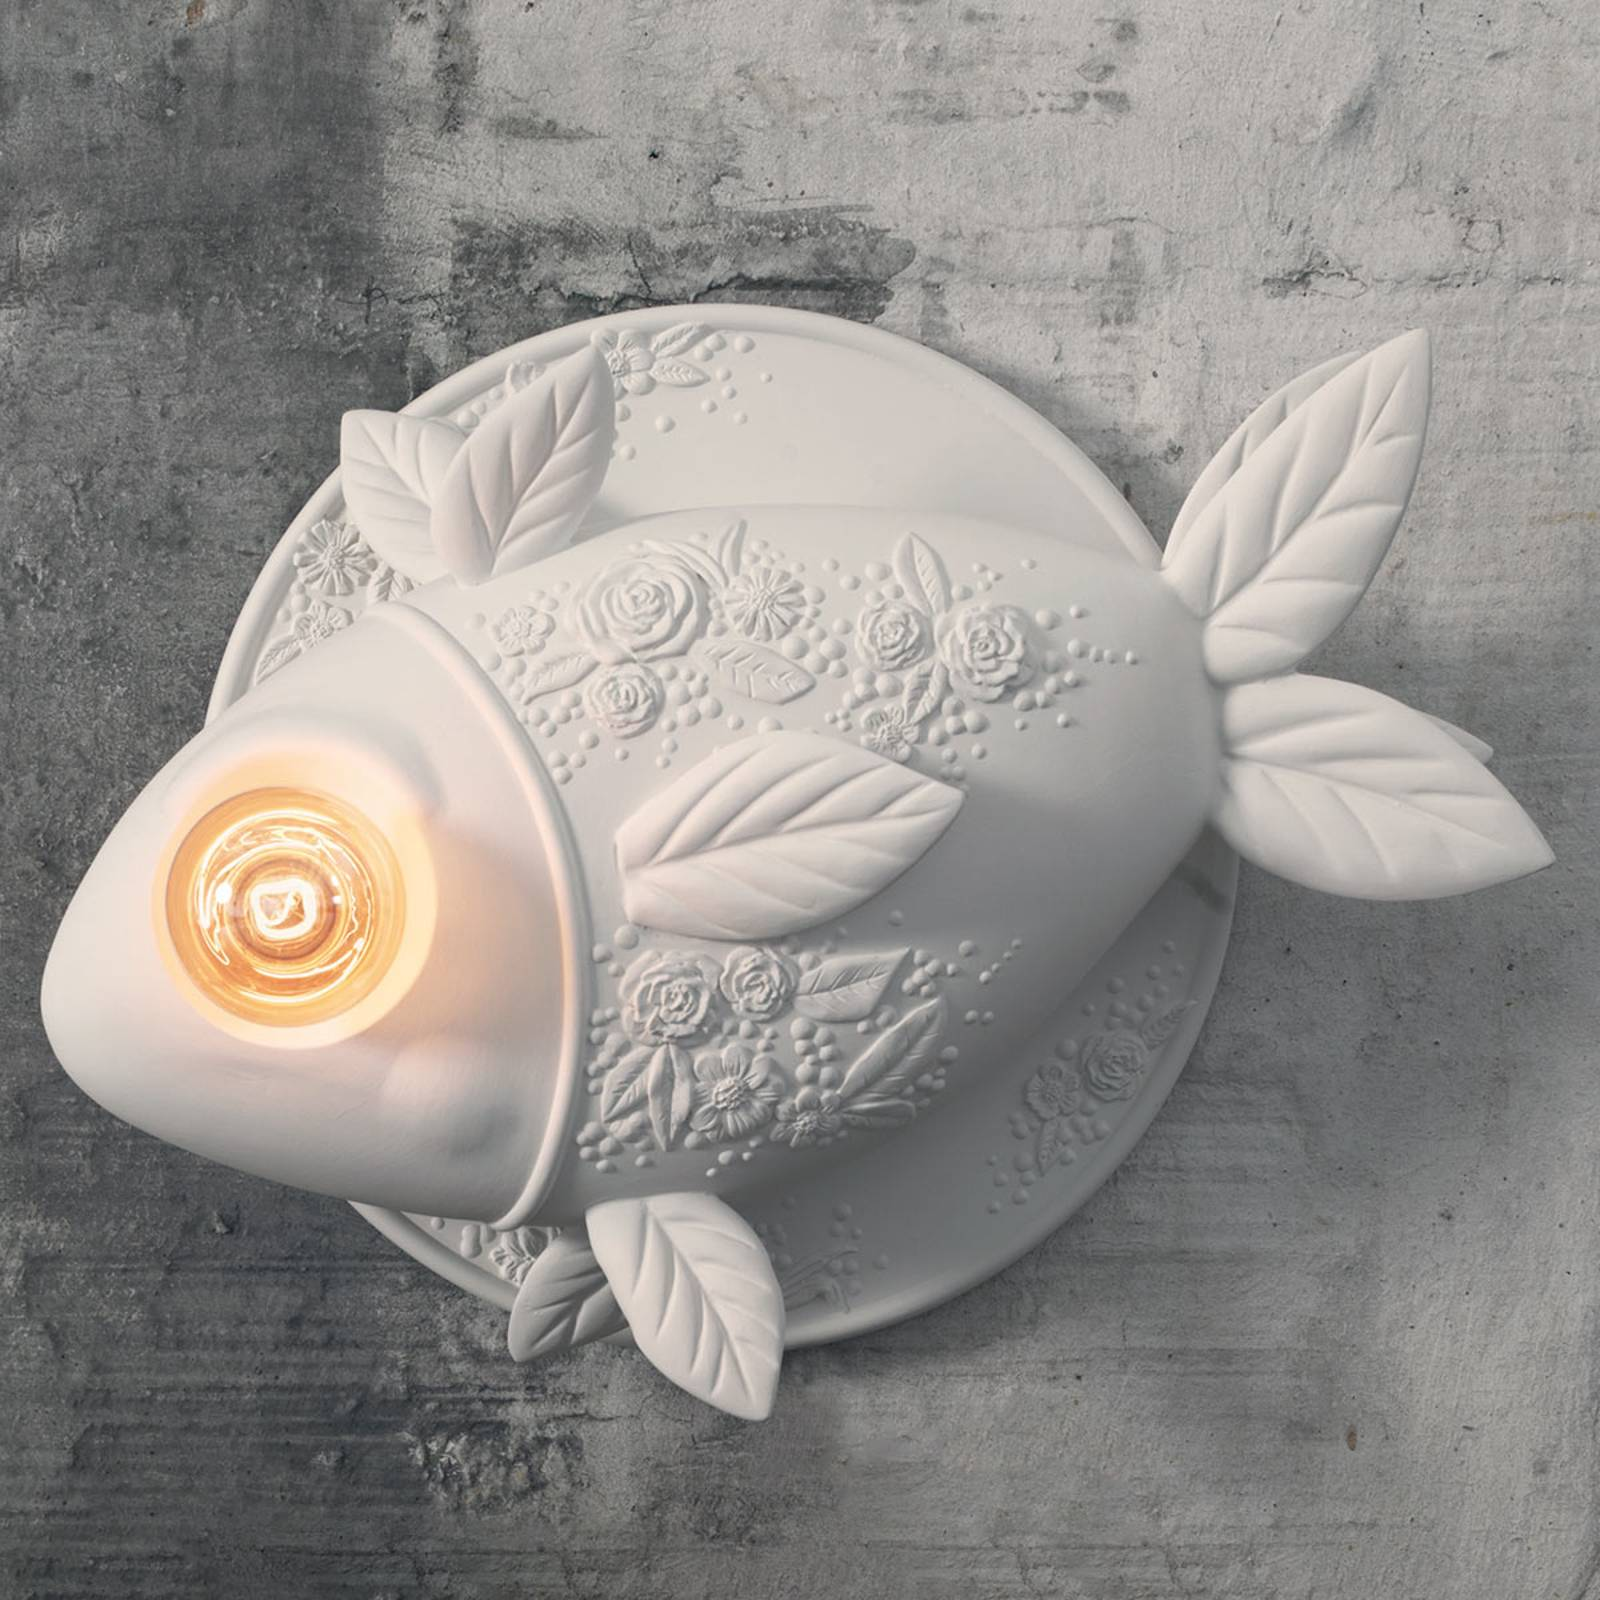 Karman Aprile - Wandleuchte in Fischform